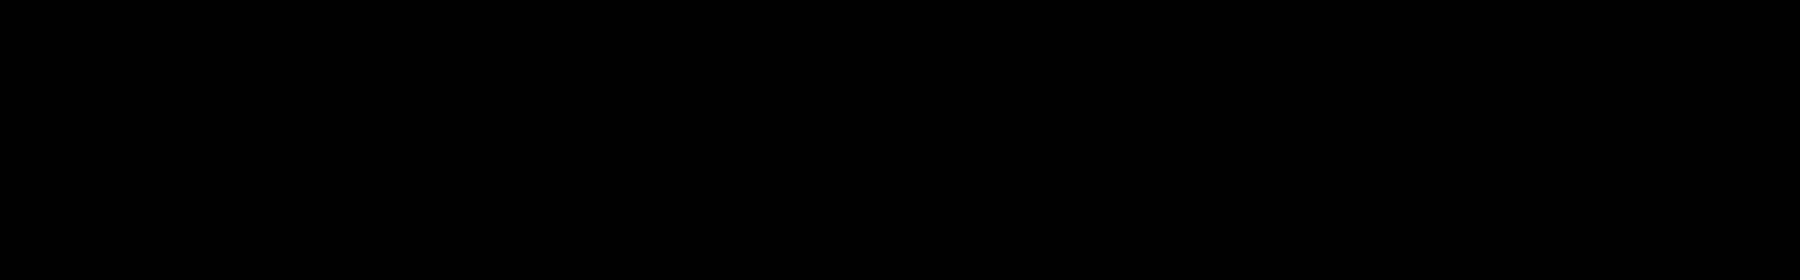 Cedra audio waveform